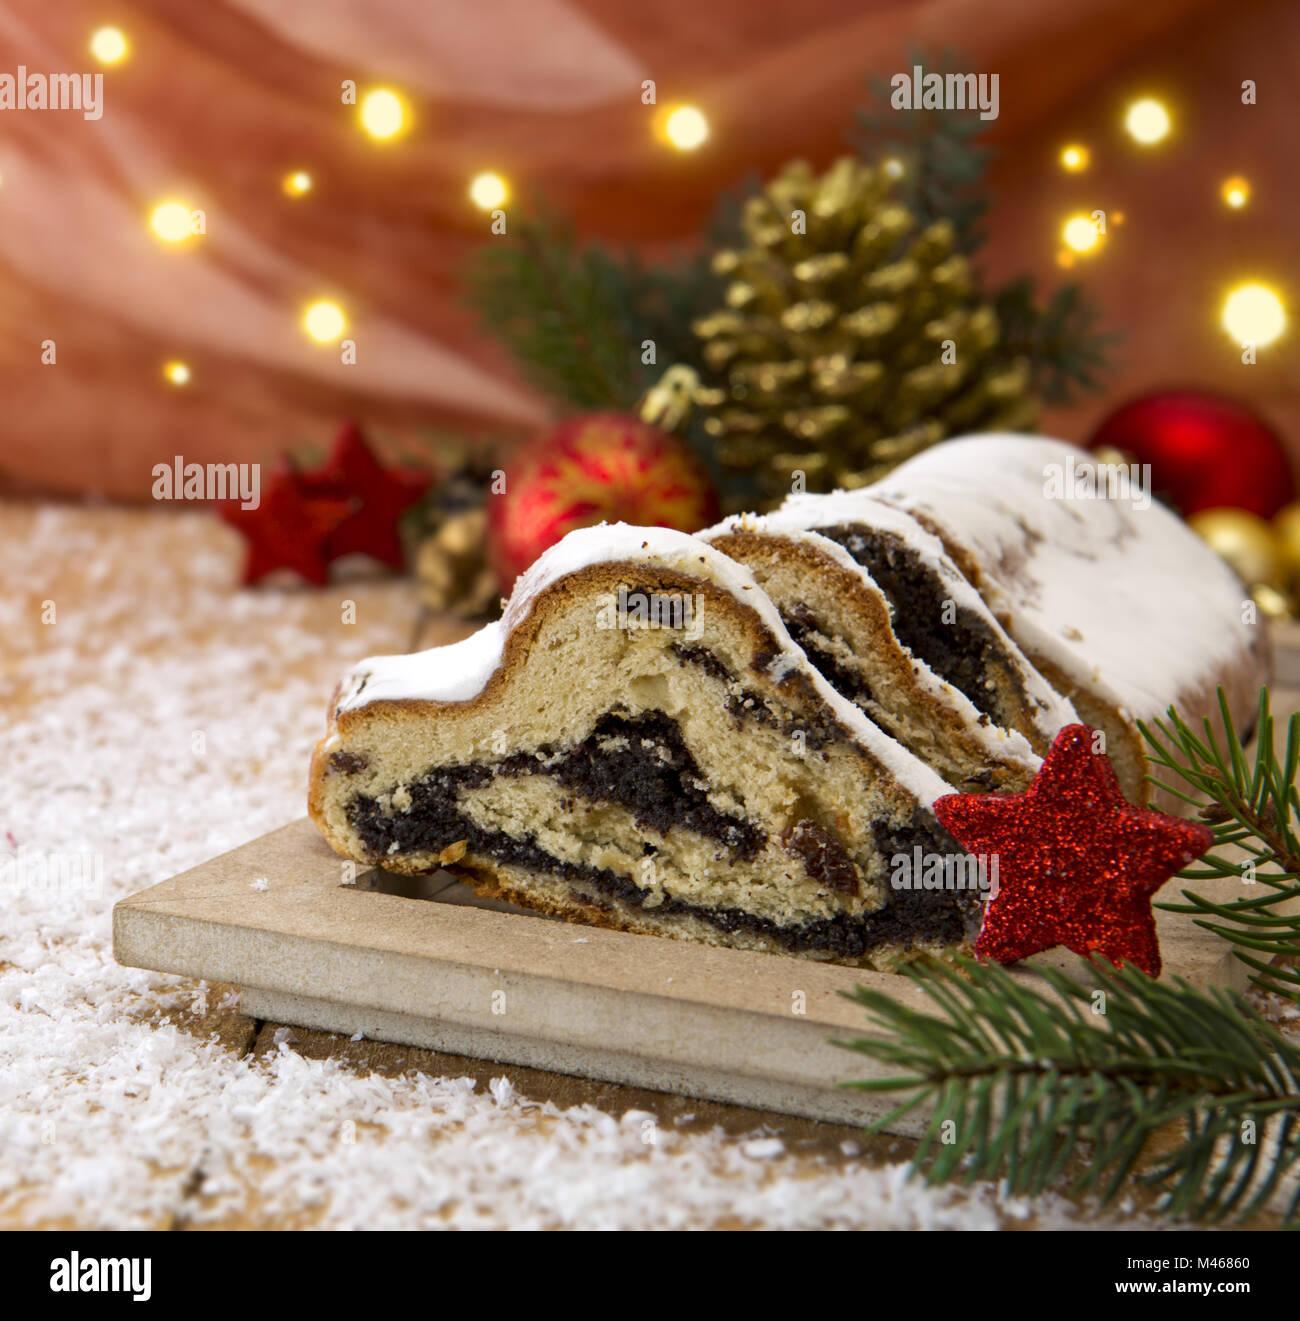 Traditional German Christmas cake   and decoration. - Stock Image